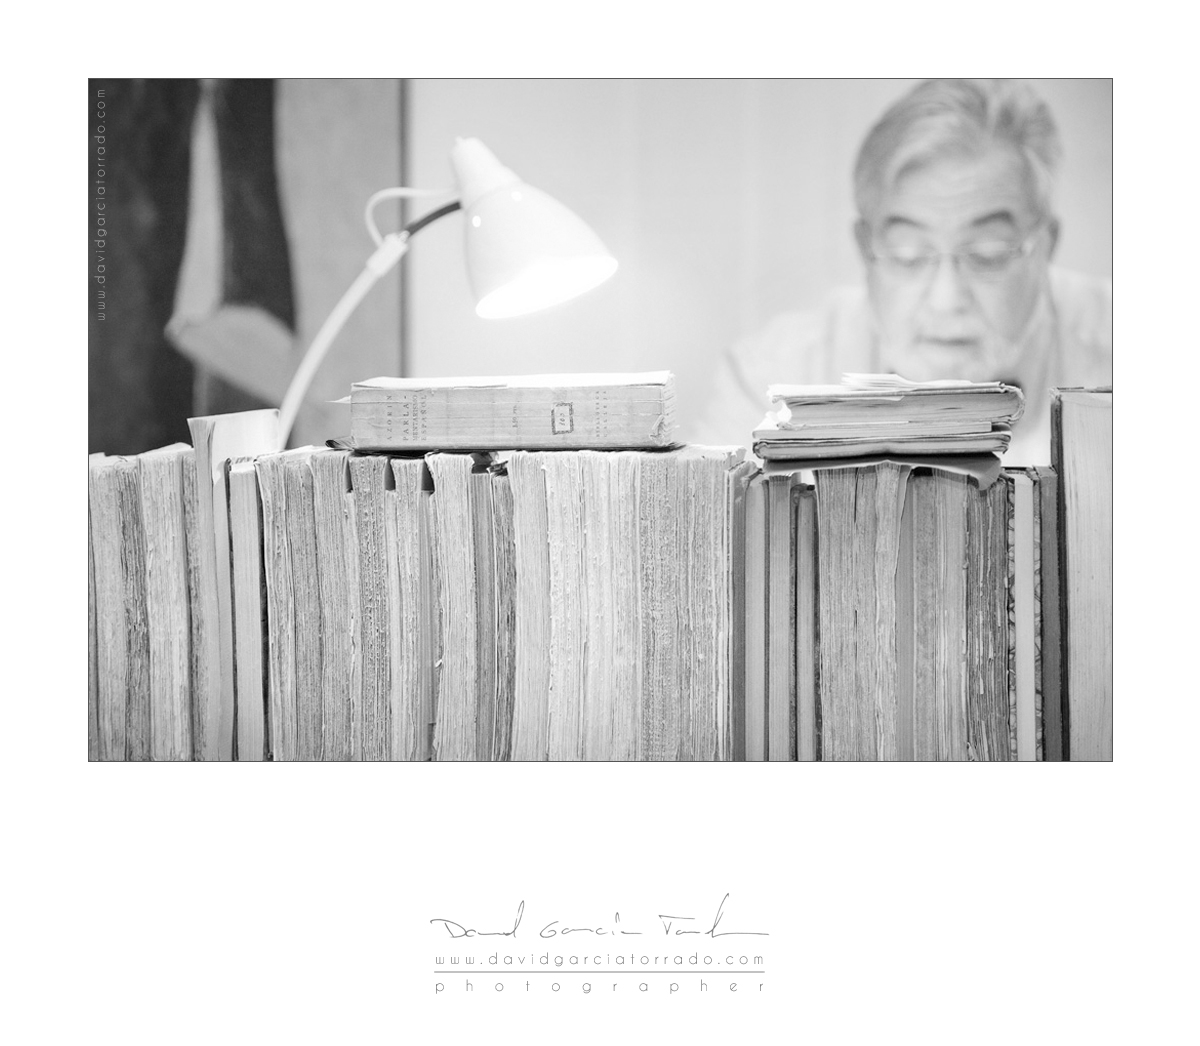 Tomás Paredes 2012 Madrid | Art critic | David García Torrado. International photographer, Asturias, Madrid, Munich.